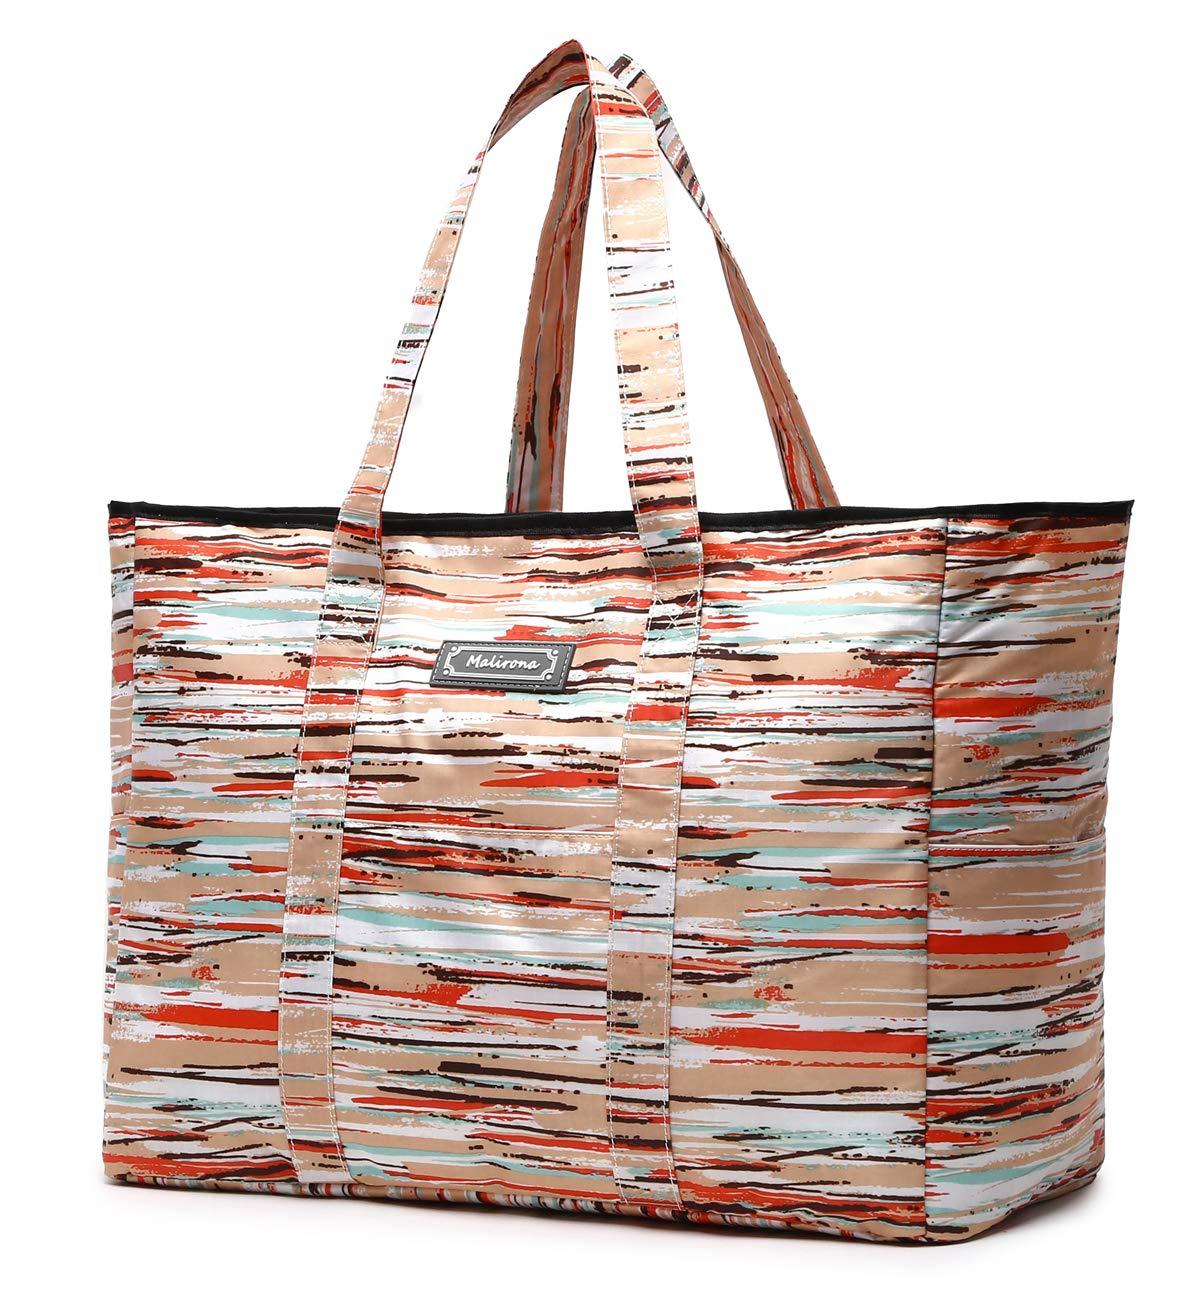 f13274e75e1 Amazon.com: Malirona Polyester Large Tote Bag, Folds Flat, Water Resistant,  Sturdy Base, Beach bag, shopping bag, outdoor storage bag (Rainbow stripes):  ...